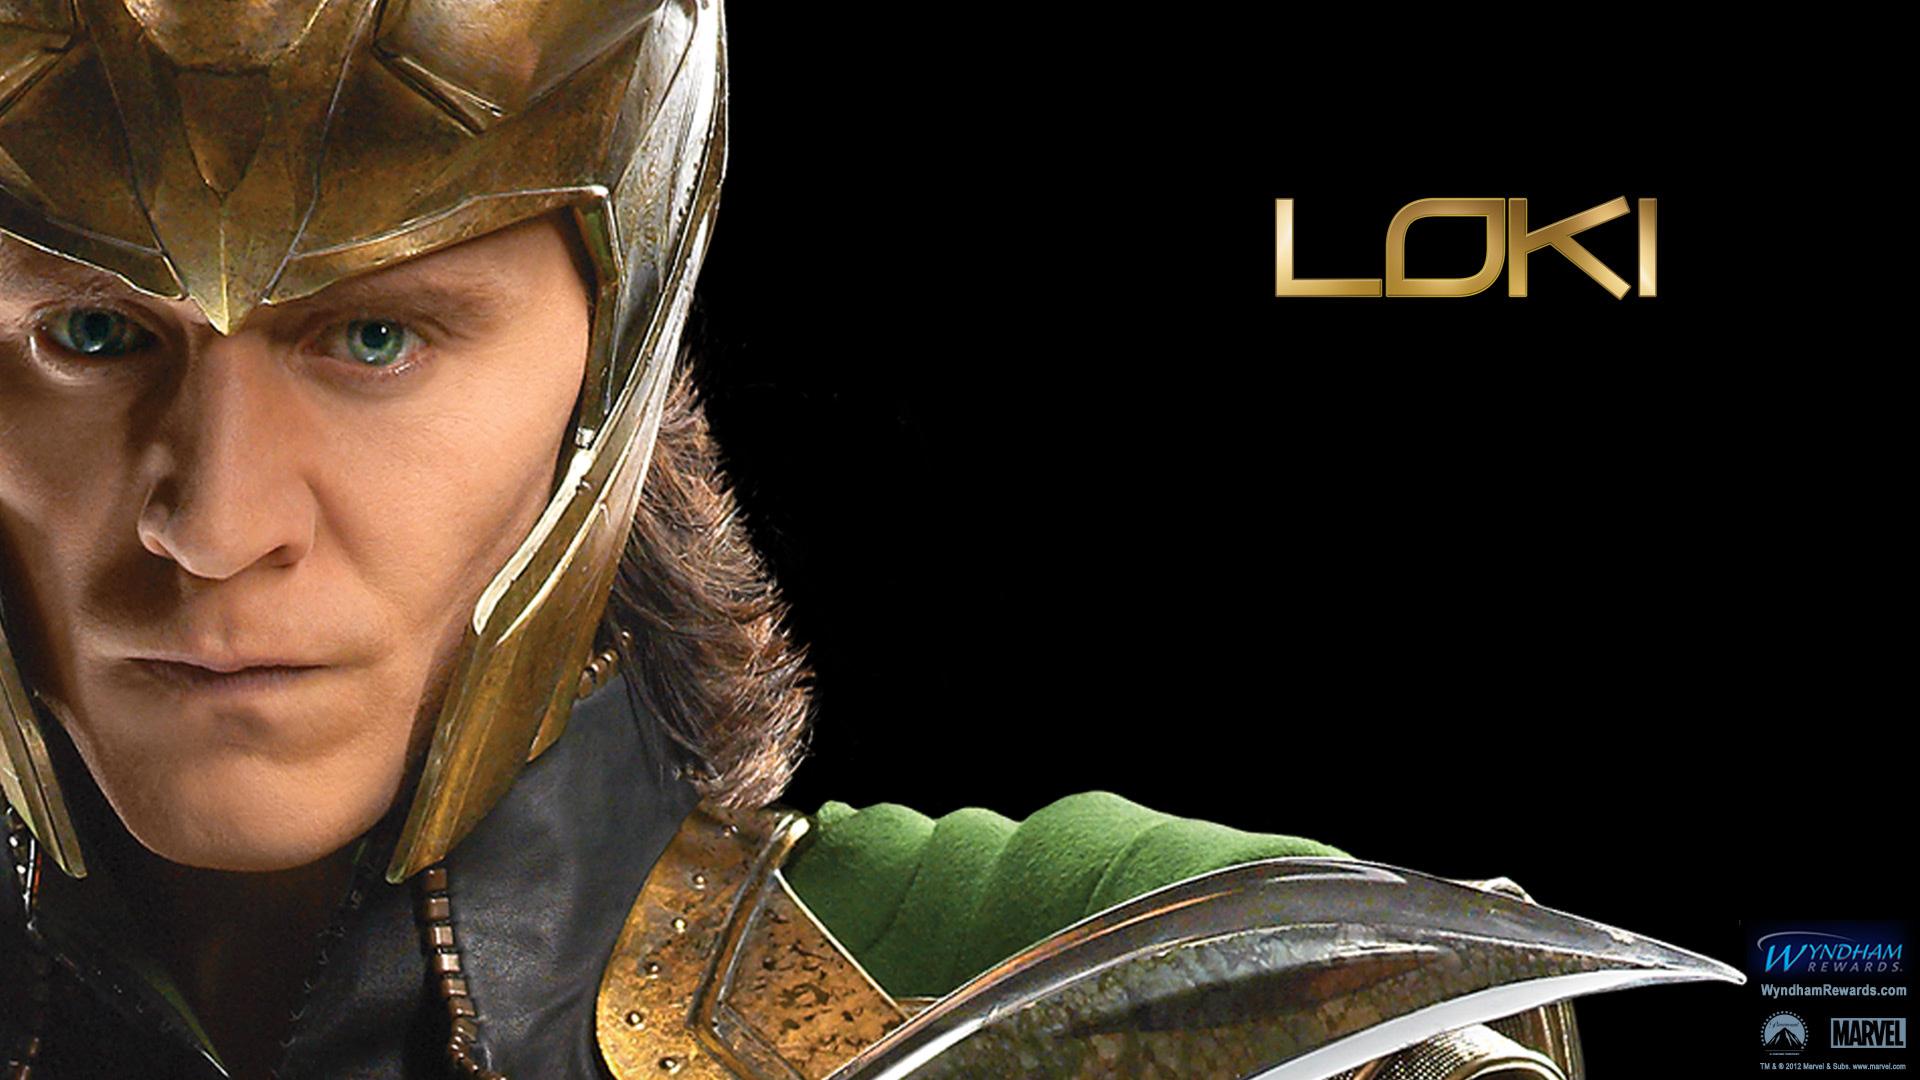 Loki The Avengers Wallpapers 1920x1080 pixel Popular HD Wallpaper 1920x1080